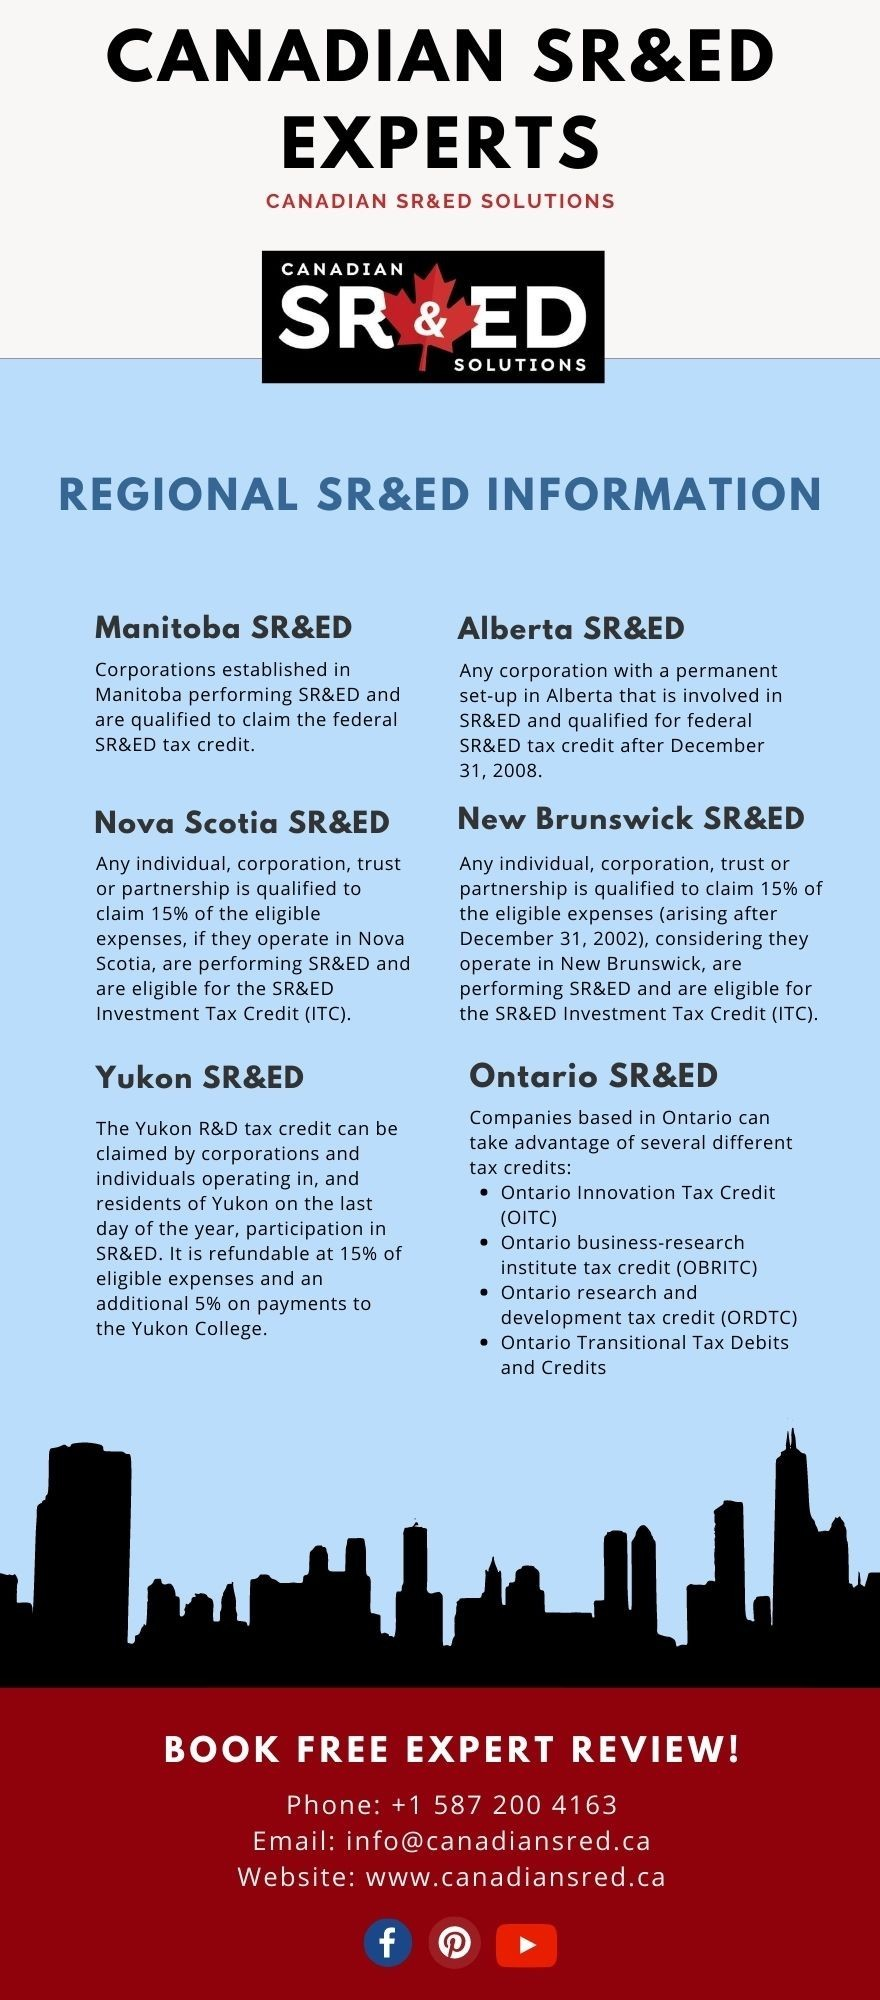 Canadian SR&ED Experts   Canadian SR&ED